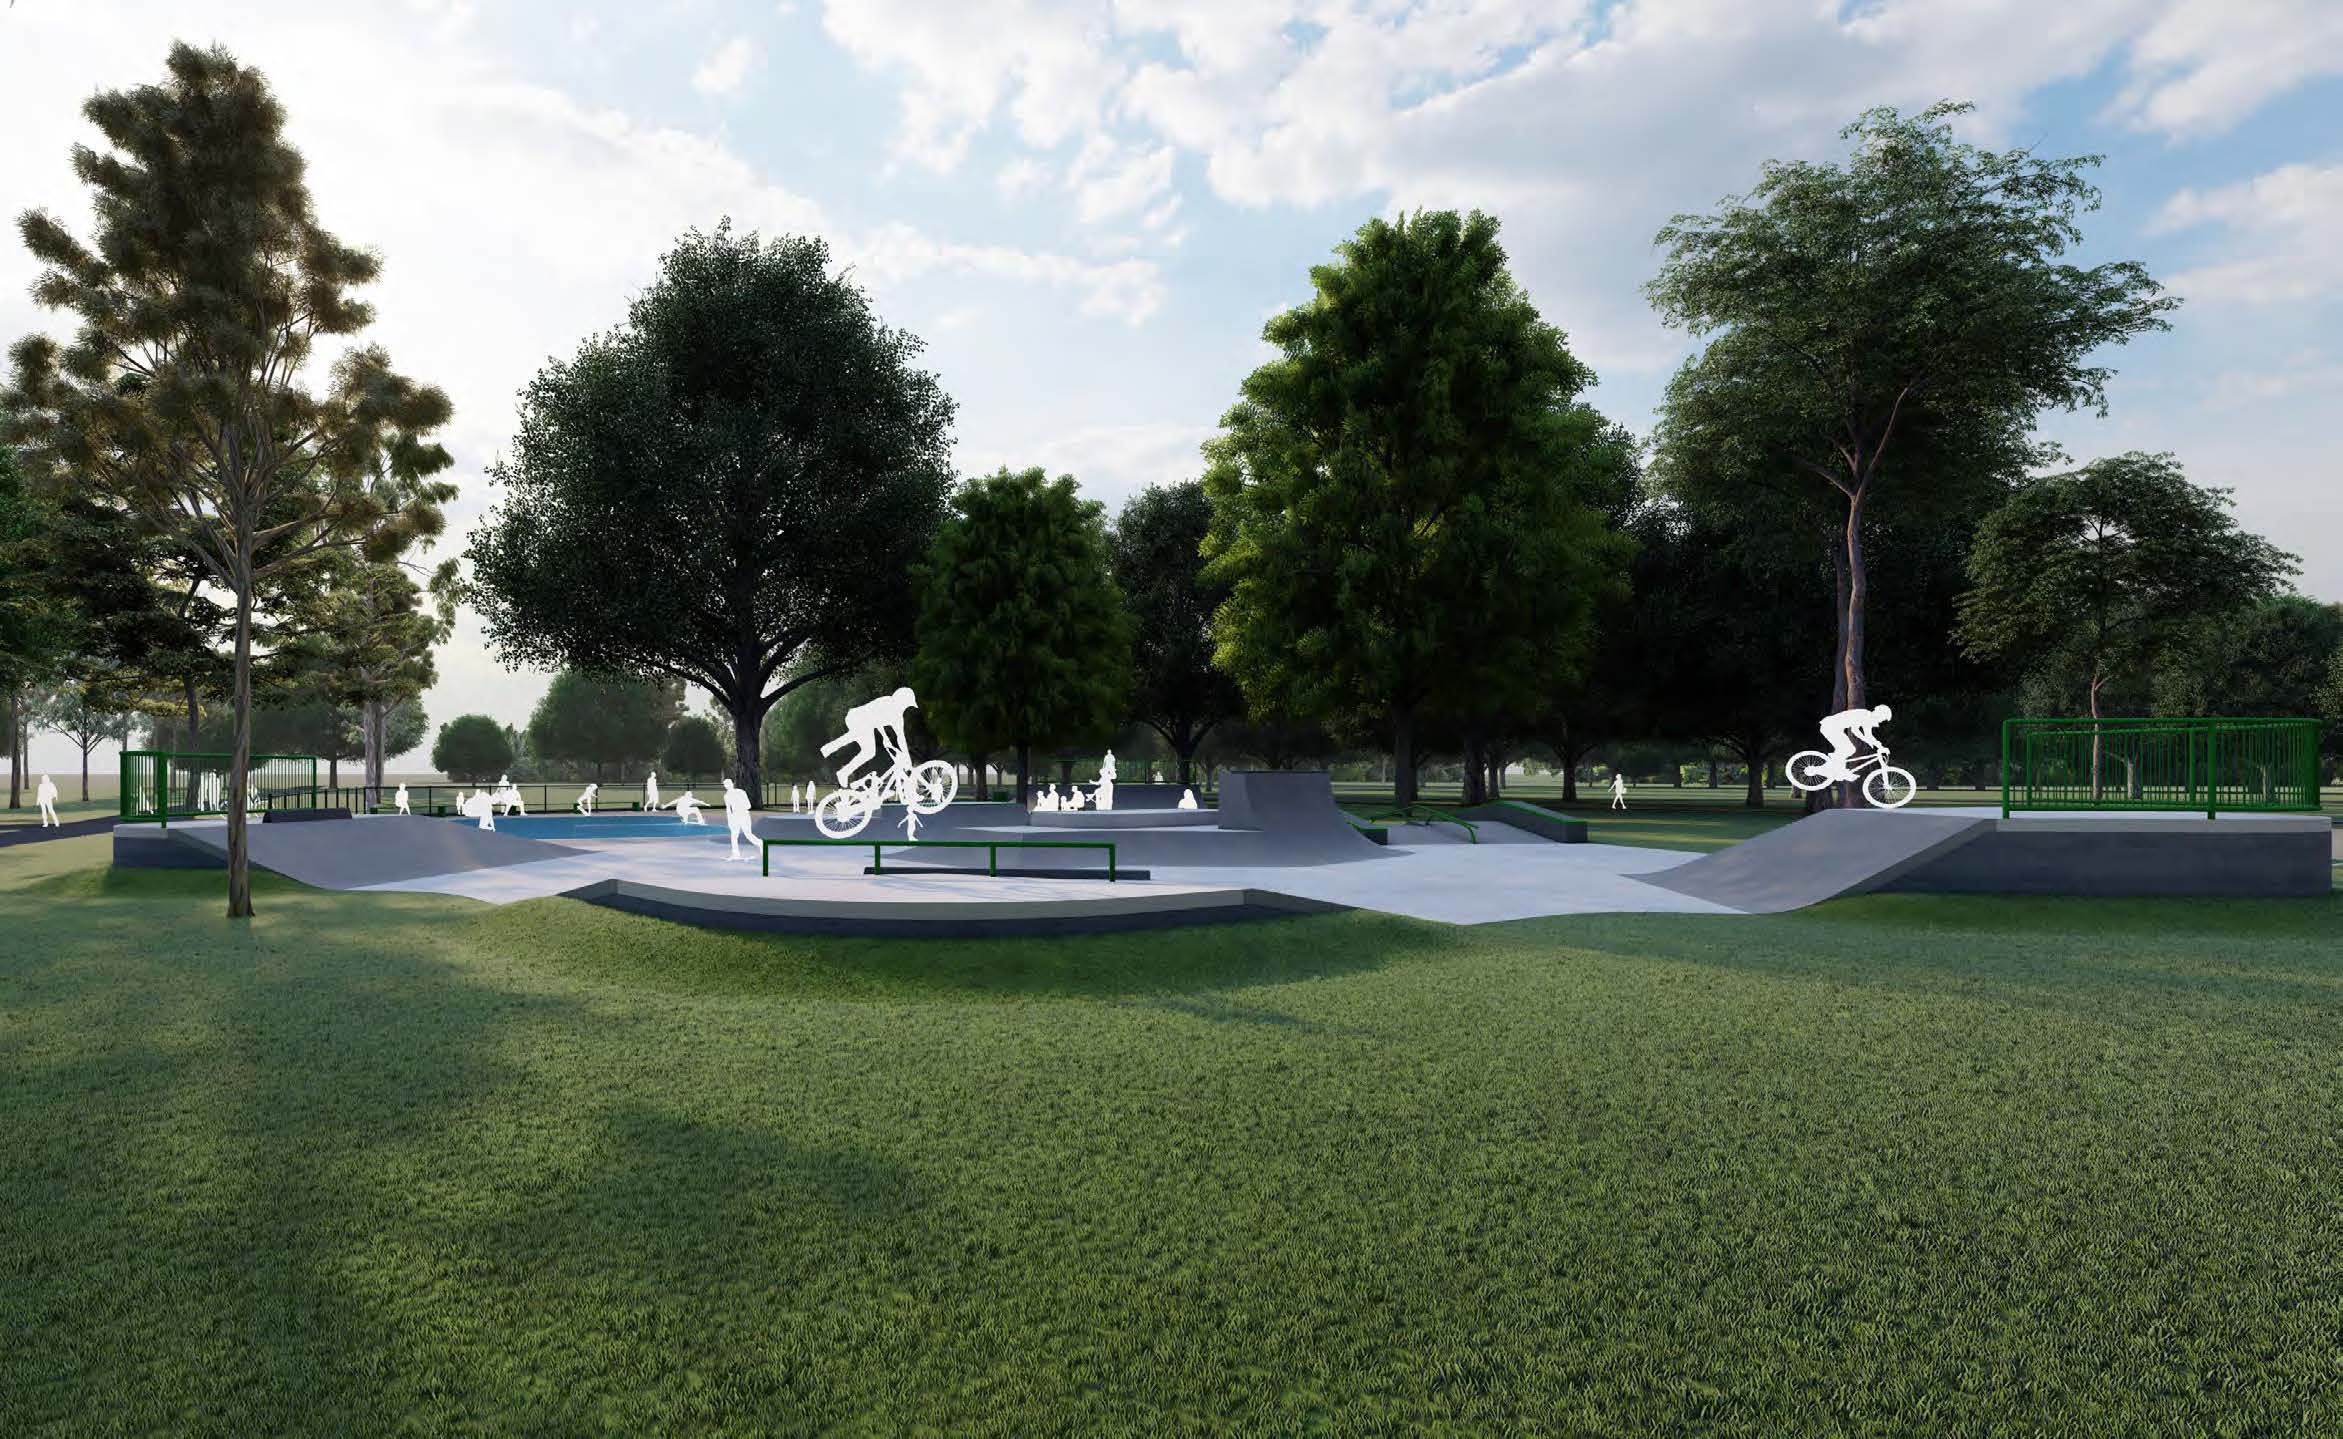 Artist's impression of an upgraded skate park for Edinburgh Gardens